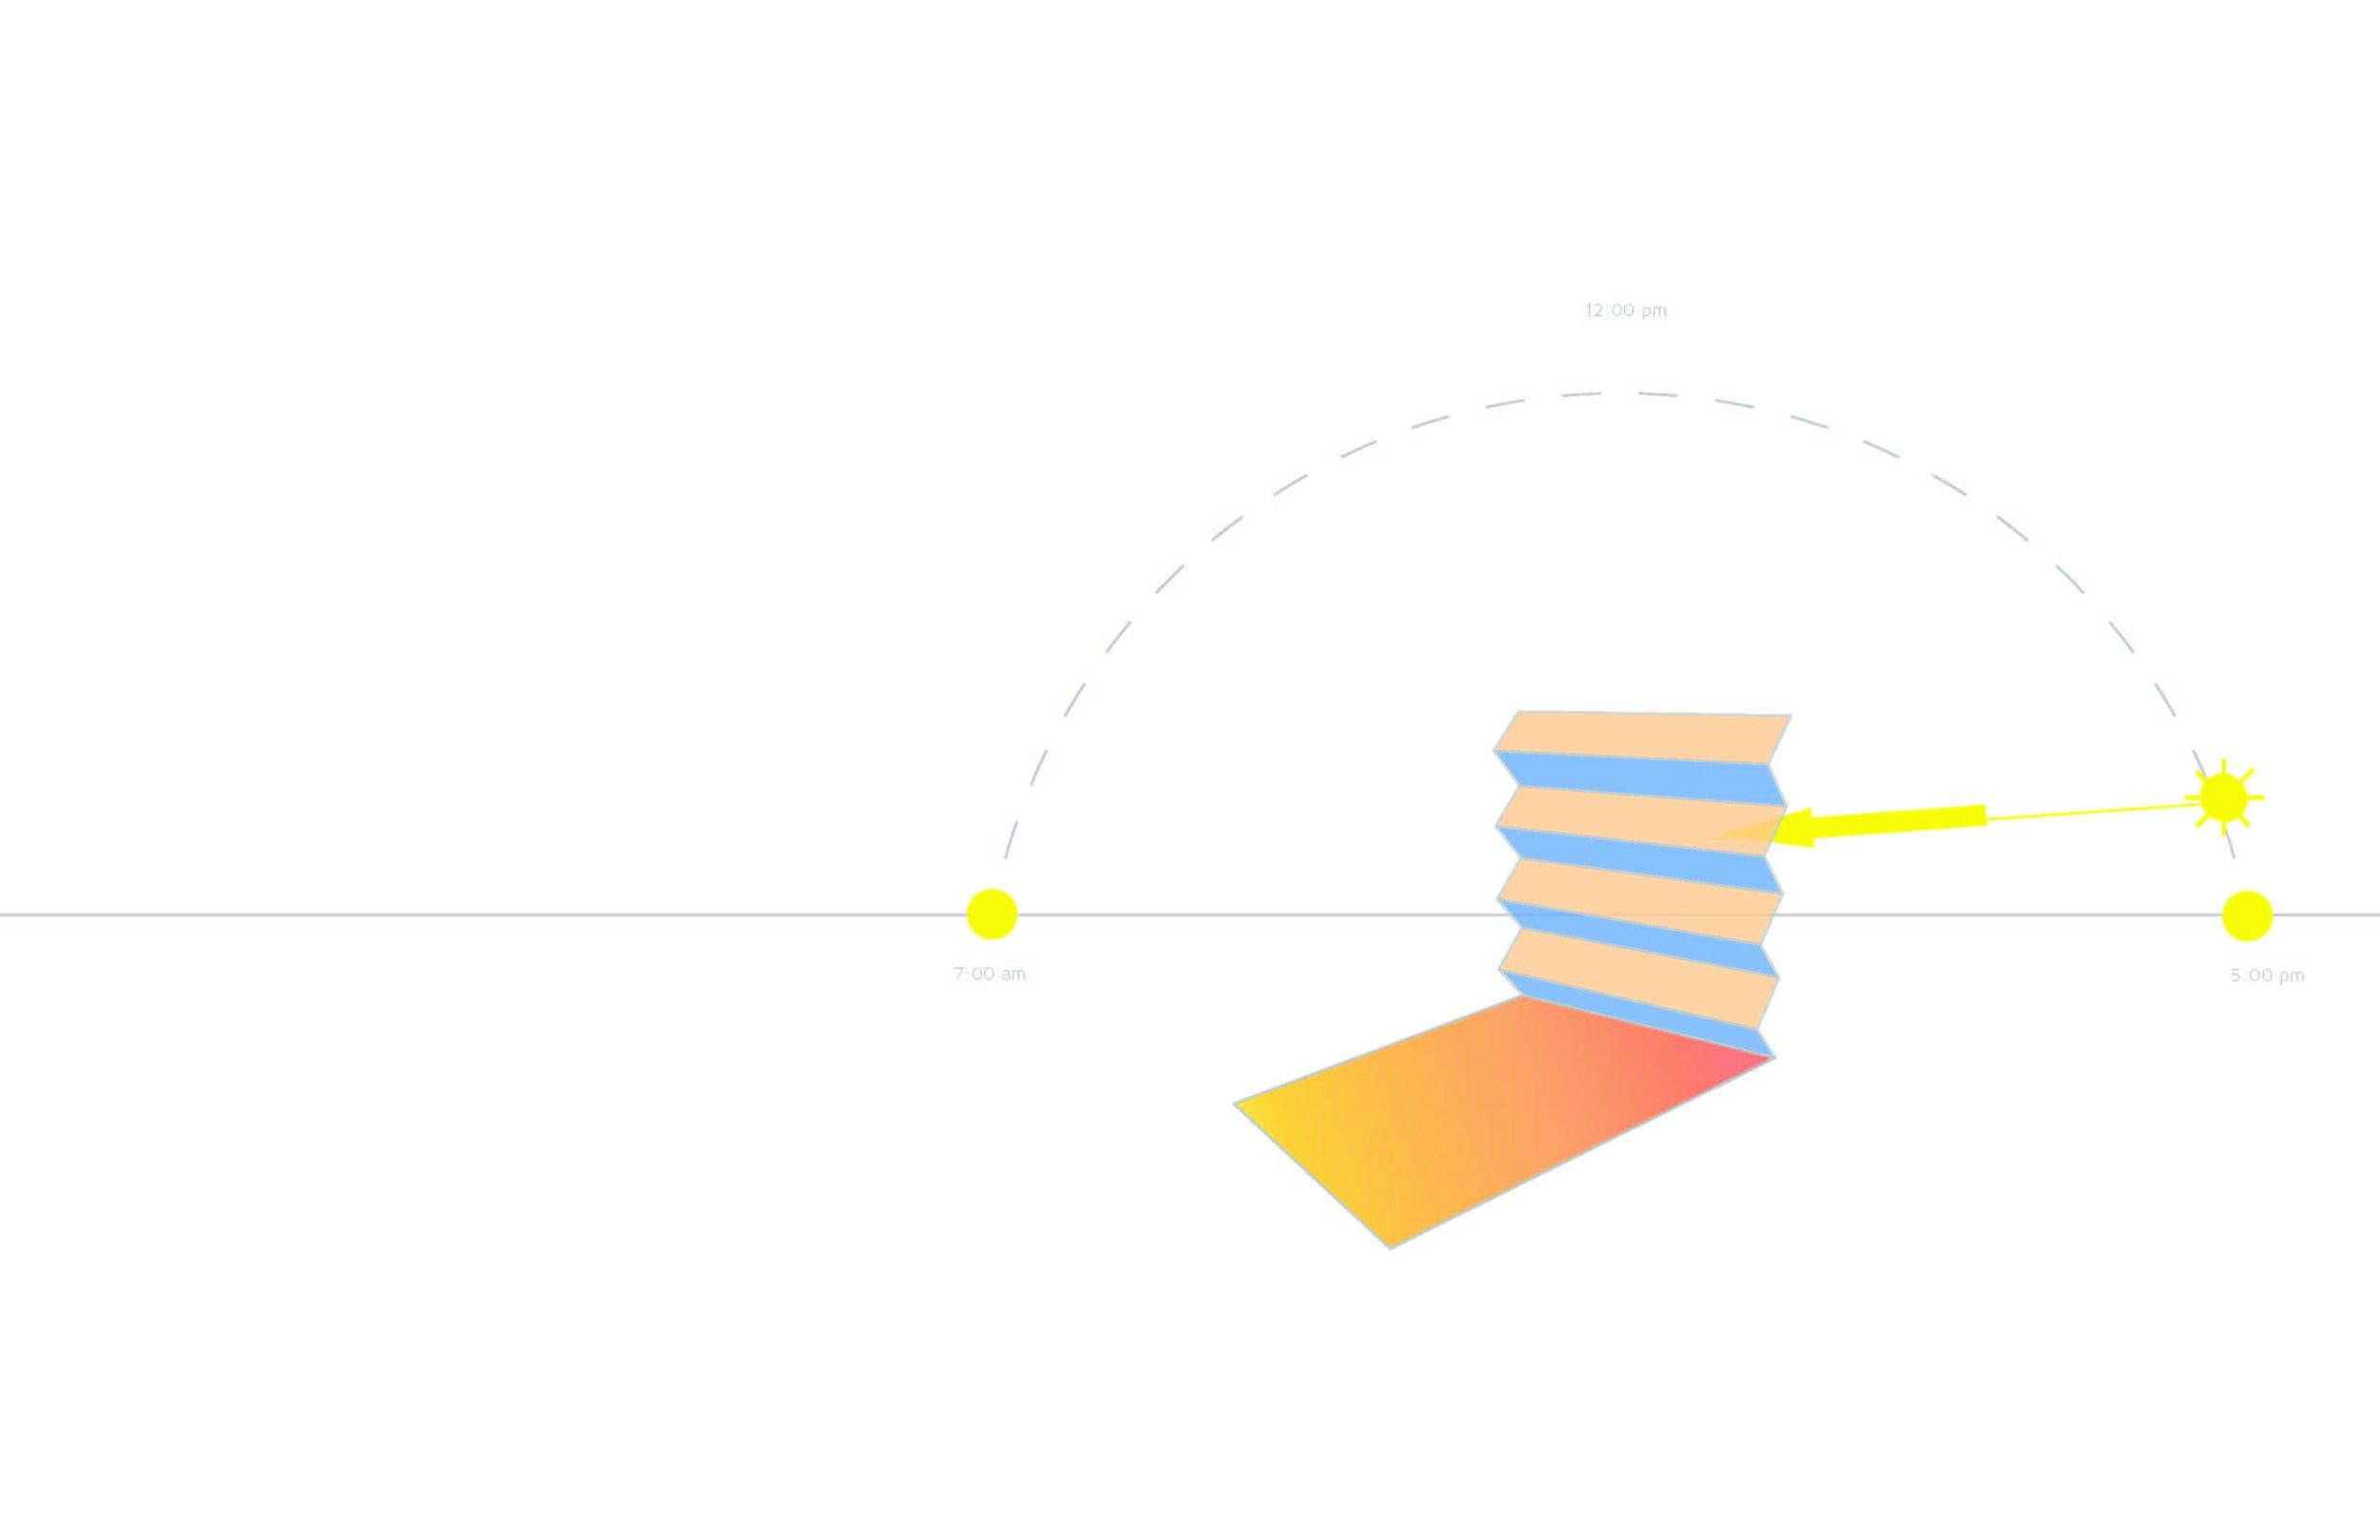 thesis_sun_diagram2.jpg